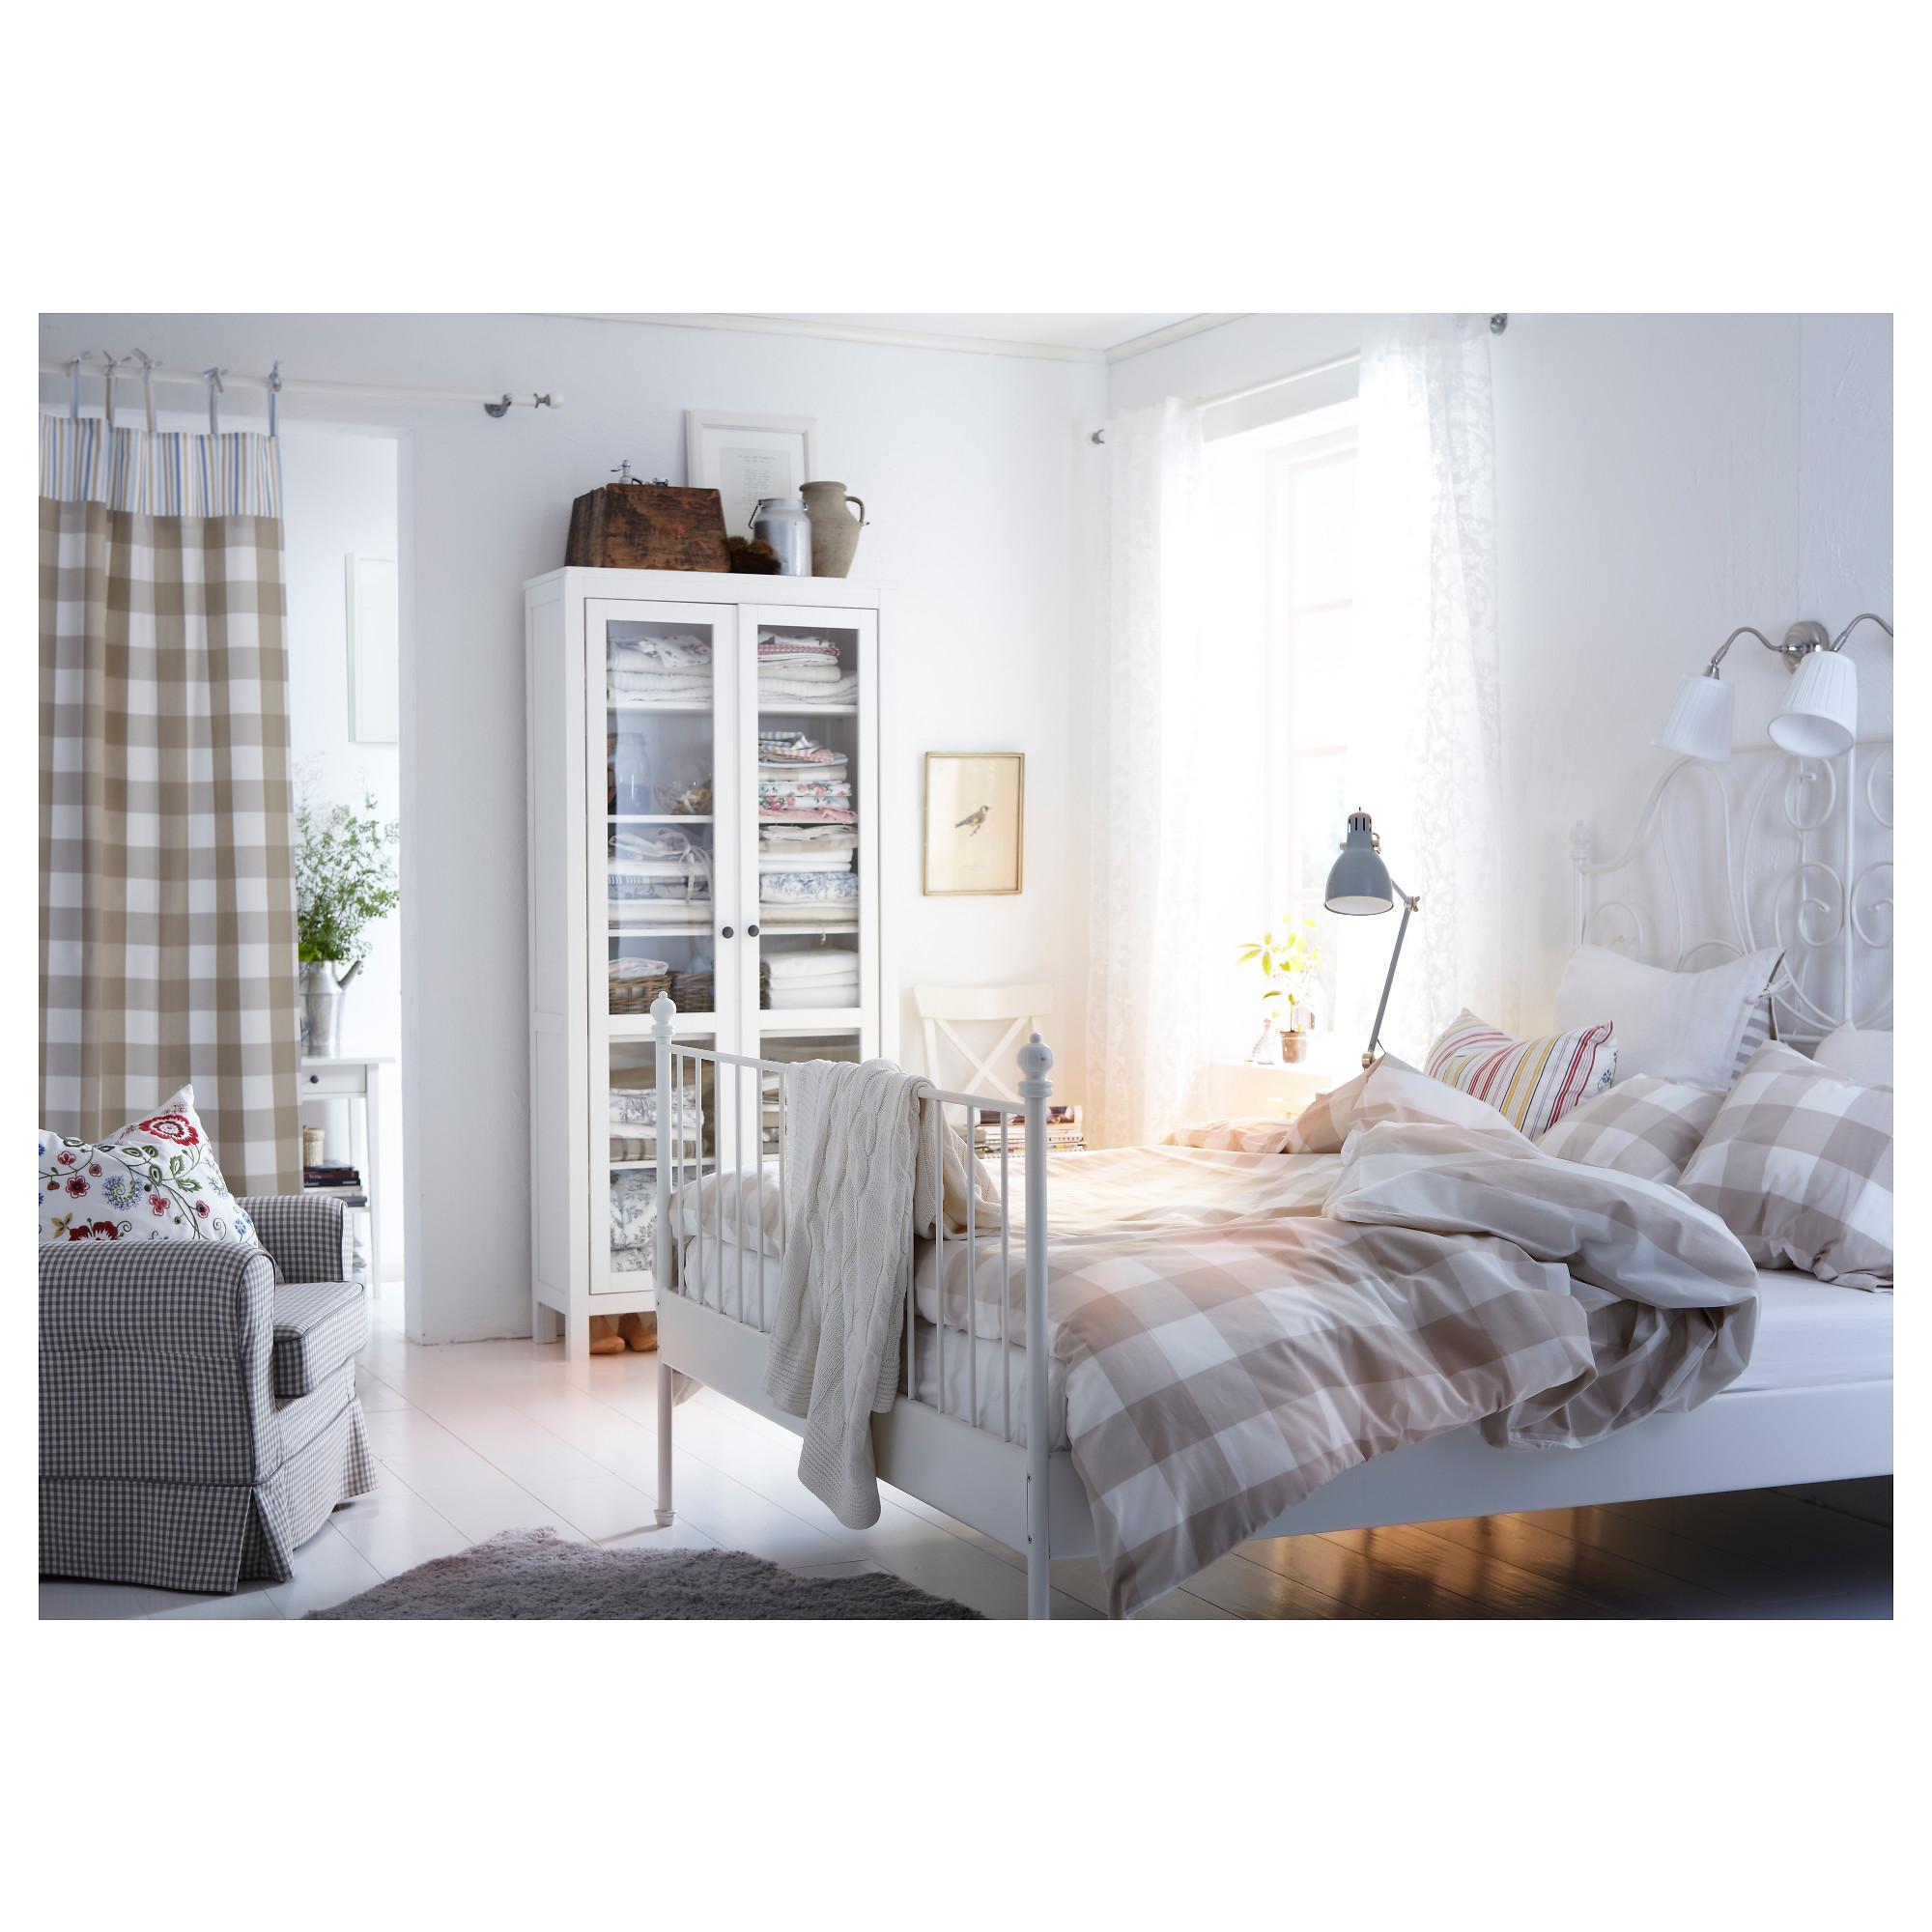 In Shanghai Ikea - Ikea - Lyle Vic - Metall Bedstead schlafzimmer, Möbel begrenzten Bereich e - mail - packung